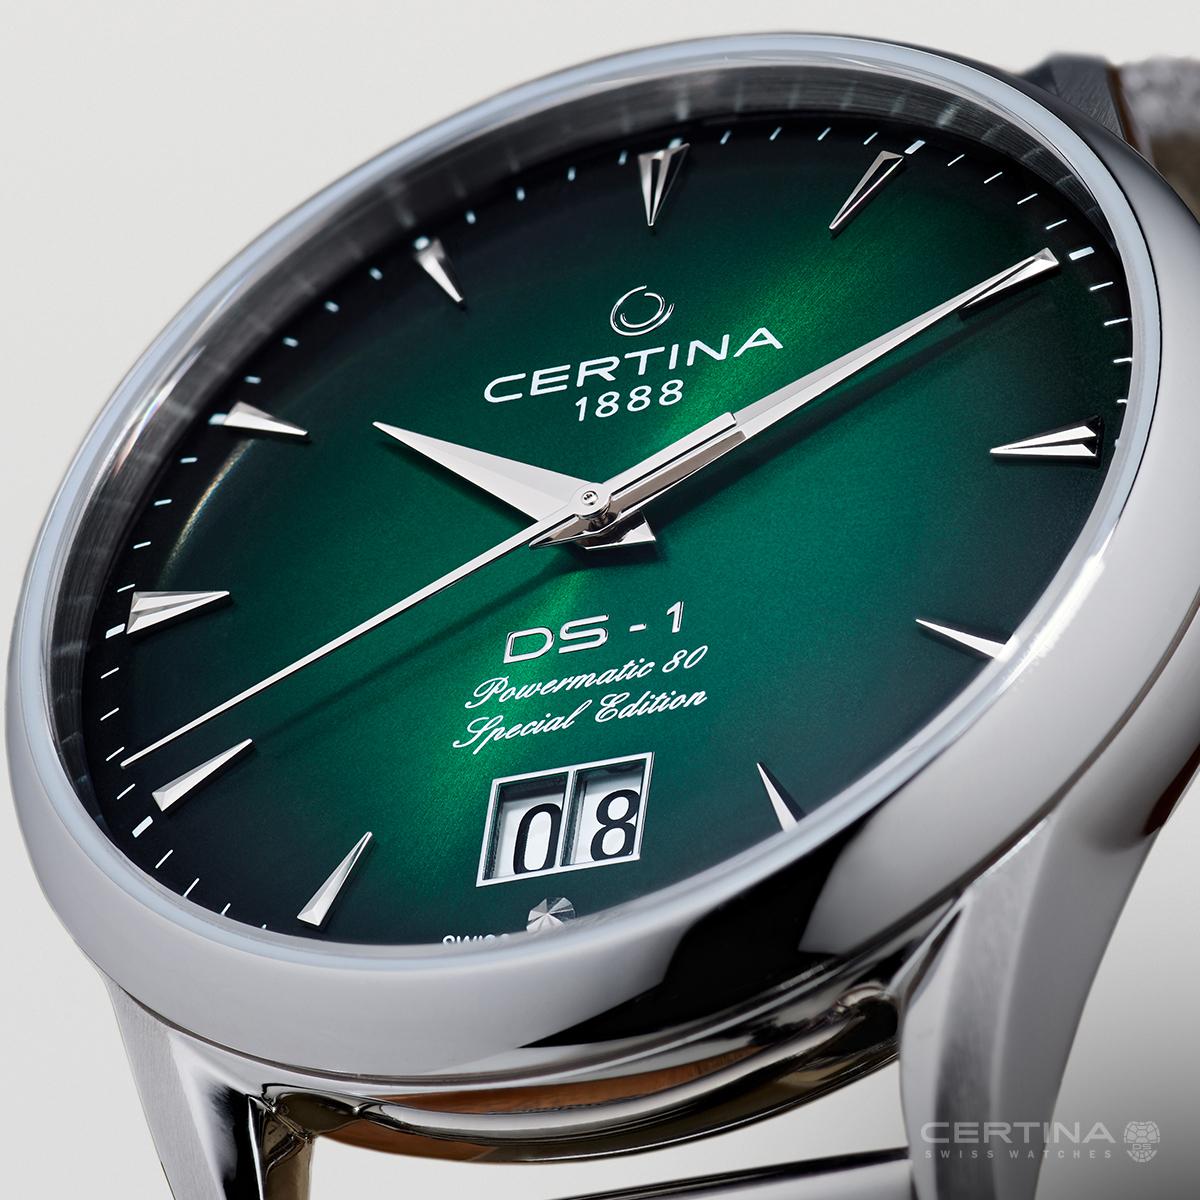 Piękna, zielona tarcza zegarka Certina DS-1 Nivachron™ Big Date 60th Anniversary